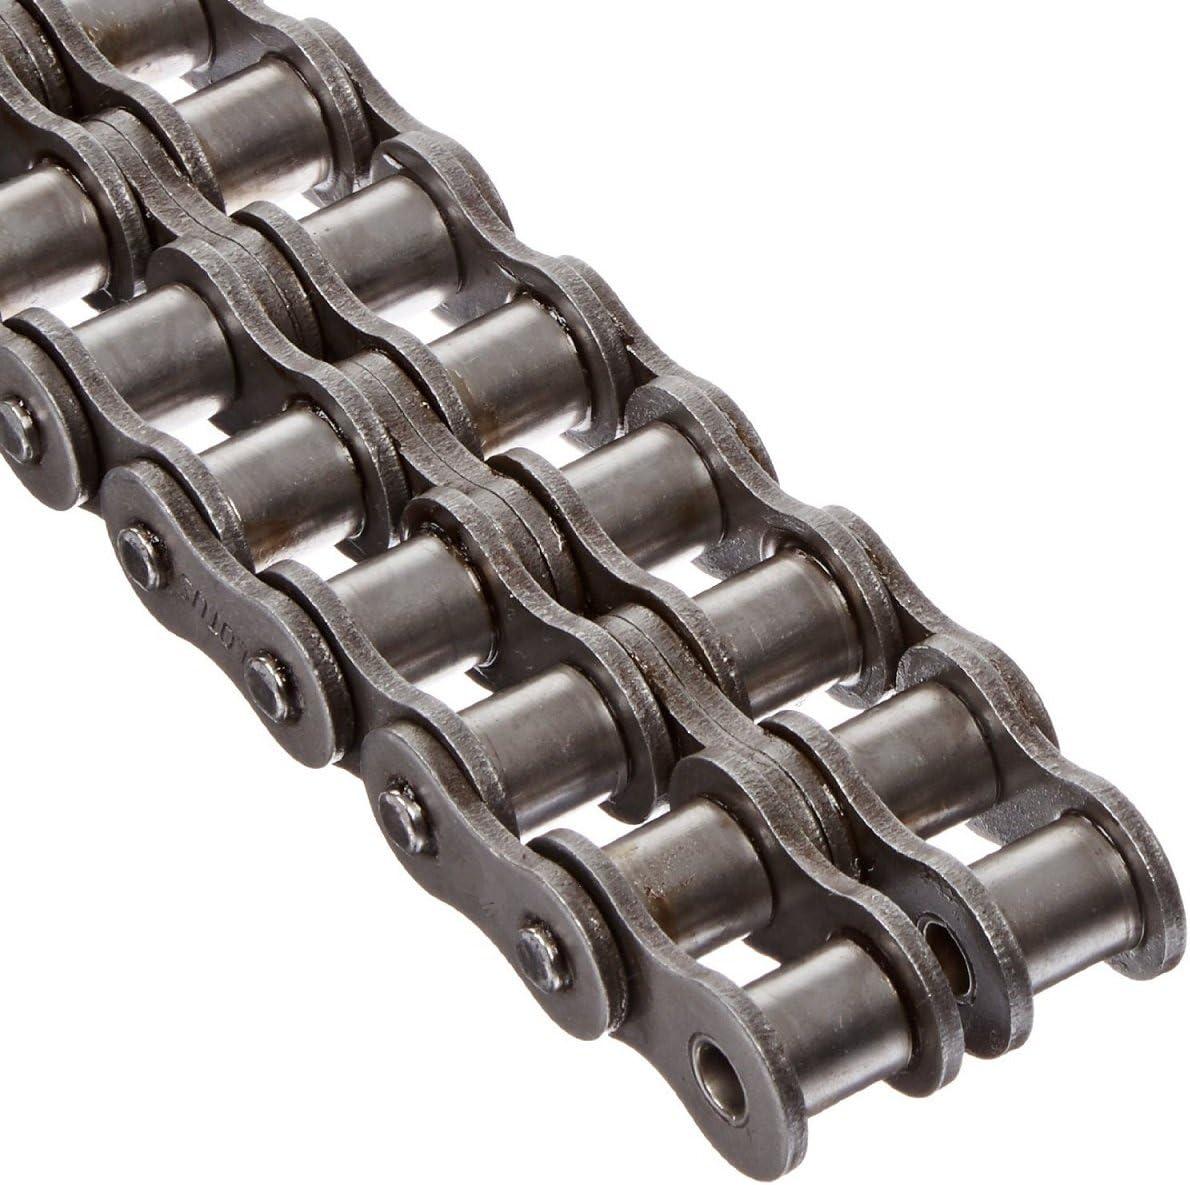 #120 ANSI No. 1-1//2 Pitch 22 Teeth Split Taper Design Single Strand Tsubaki 120R22 Roller Chain Sprocket R Bushing Required